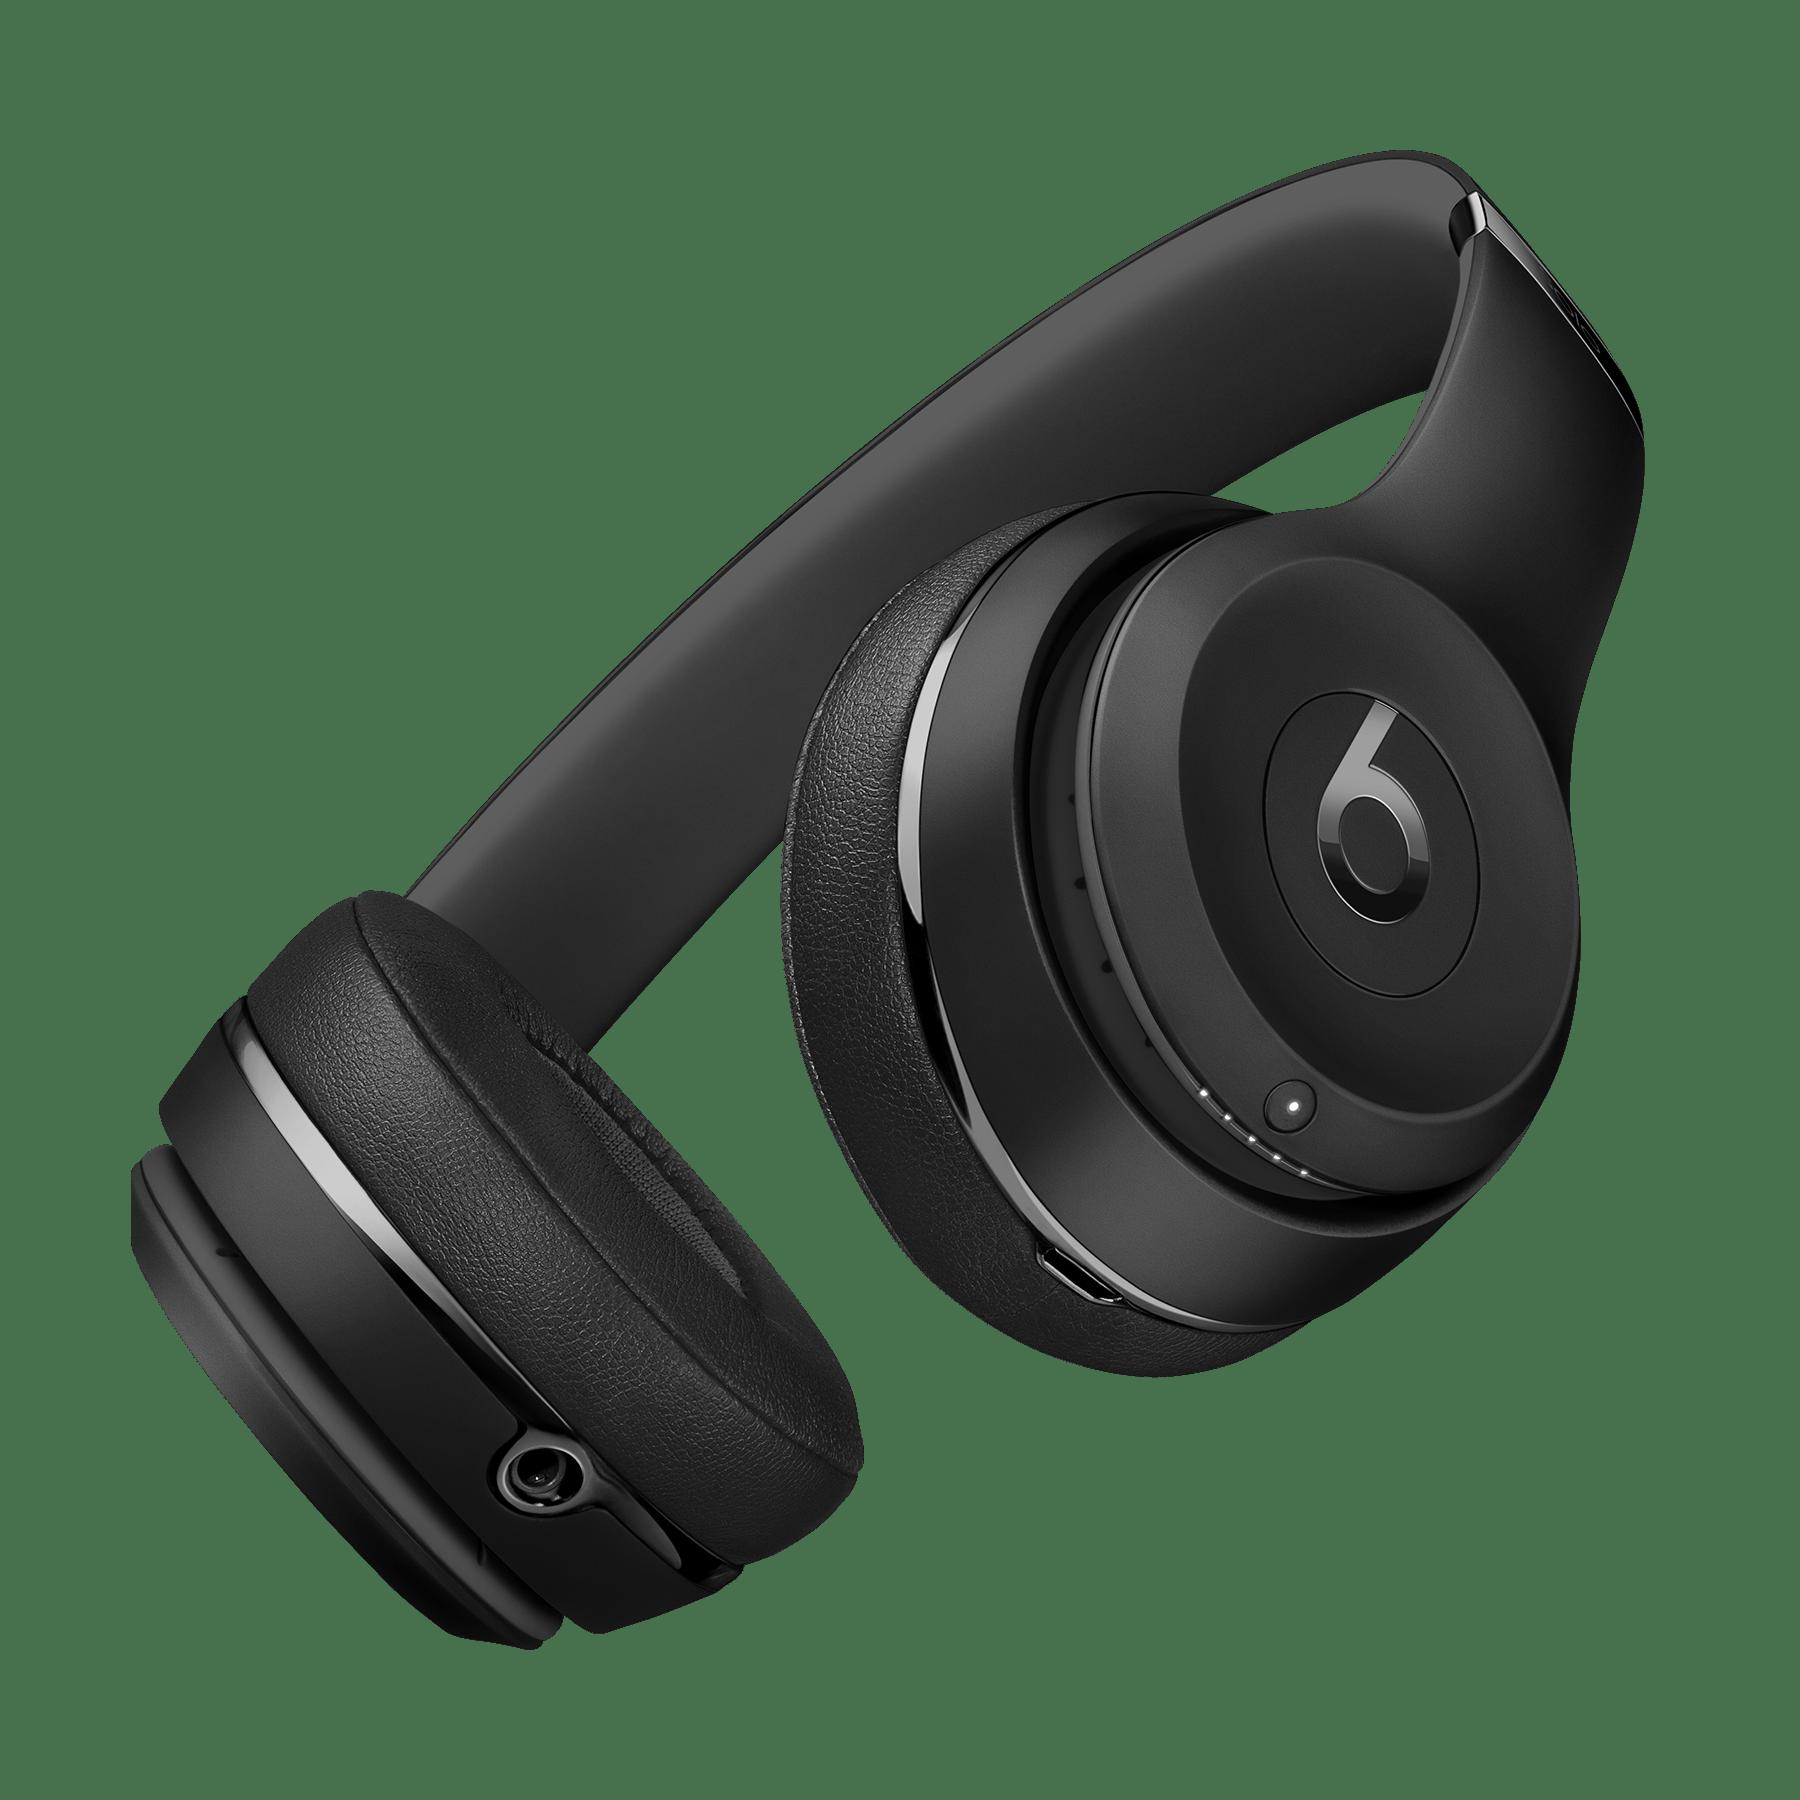 Bluetooth Wireless Headphones Beats Solo 2 Wire Center Testandmeasurement Transistoranddiodetester Mosfetcircuitups Solo3 By Dre Rh Beatsbydre Com Review